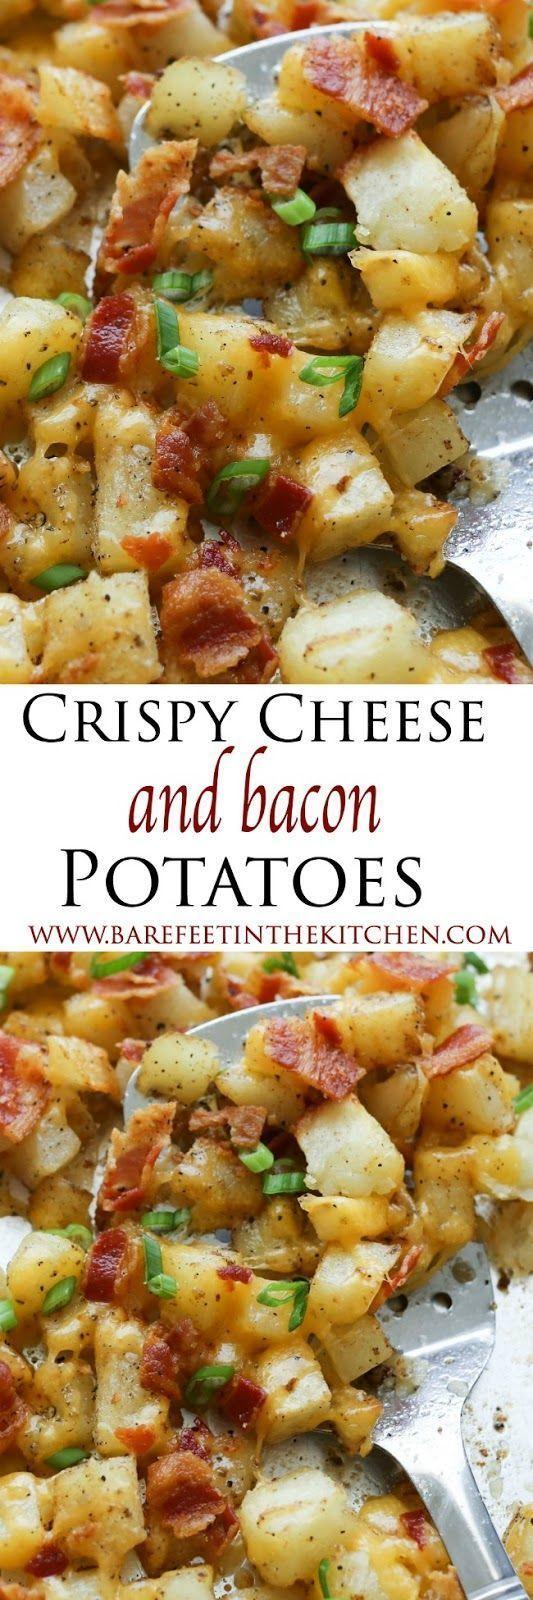 Crispy Cheese and Bacon Potatoes